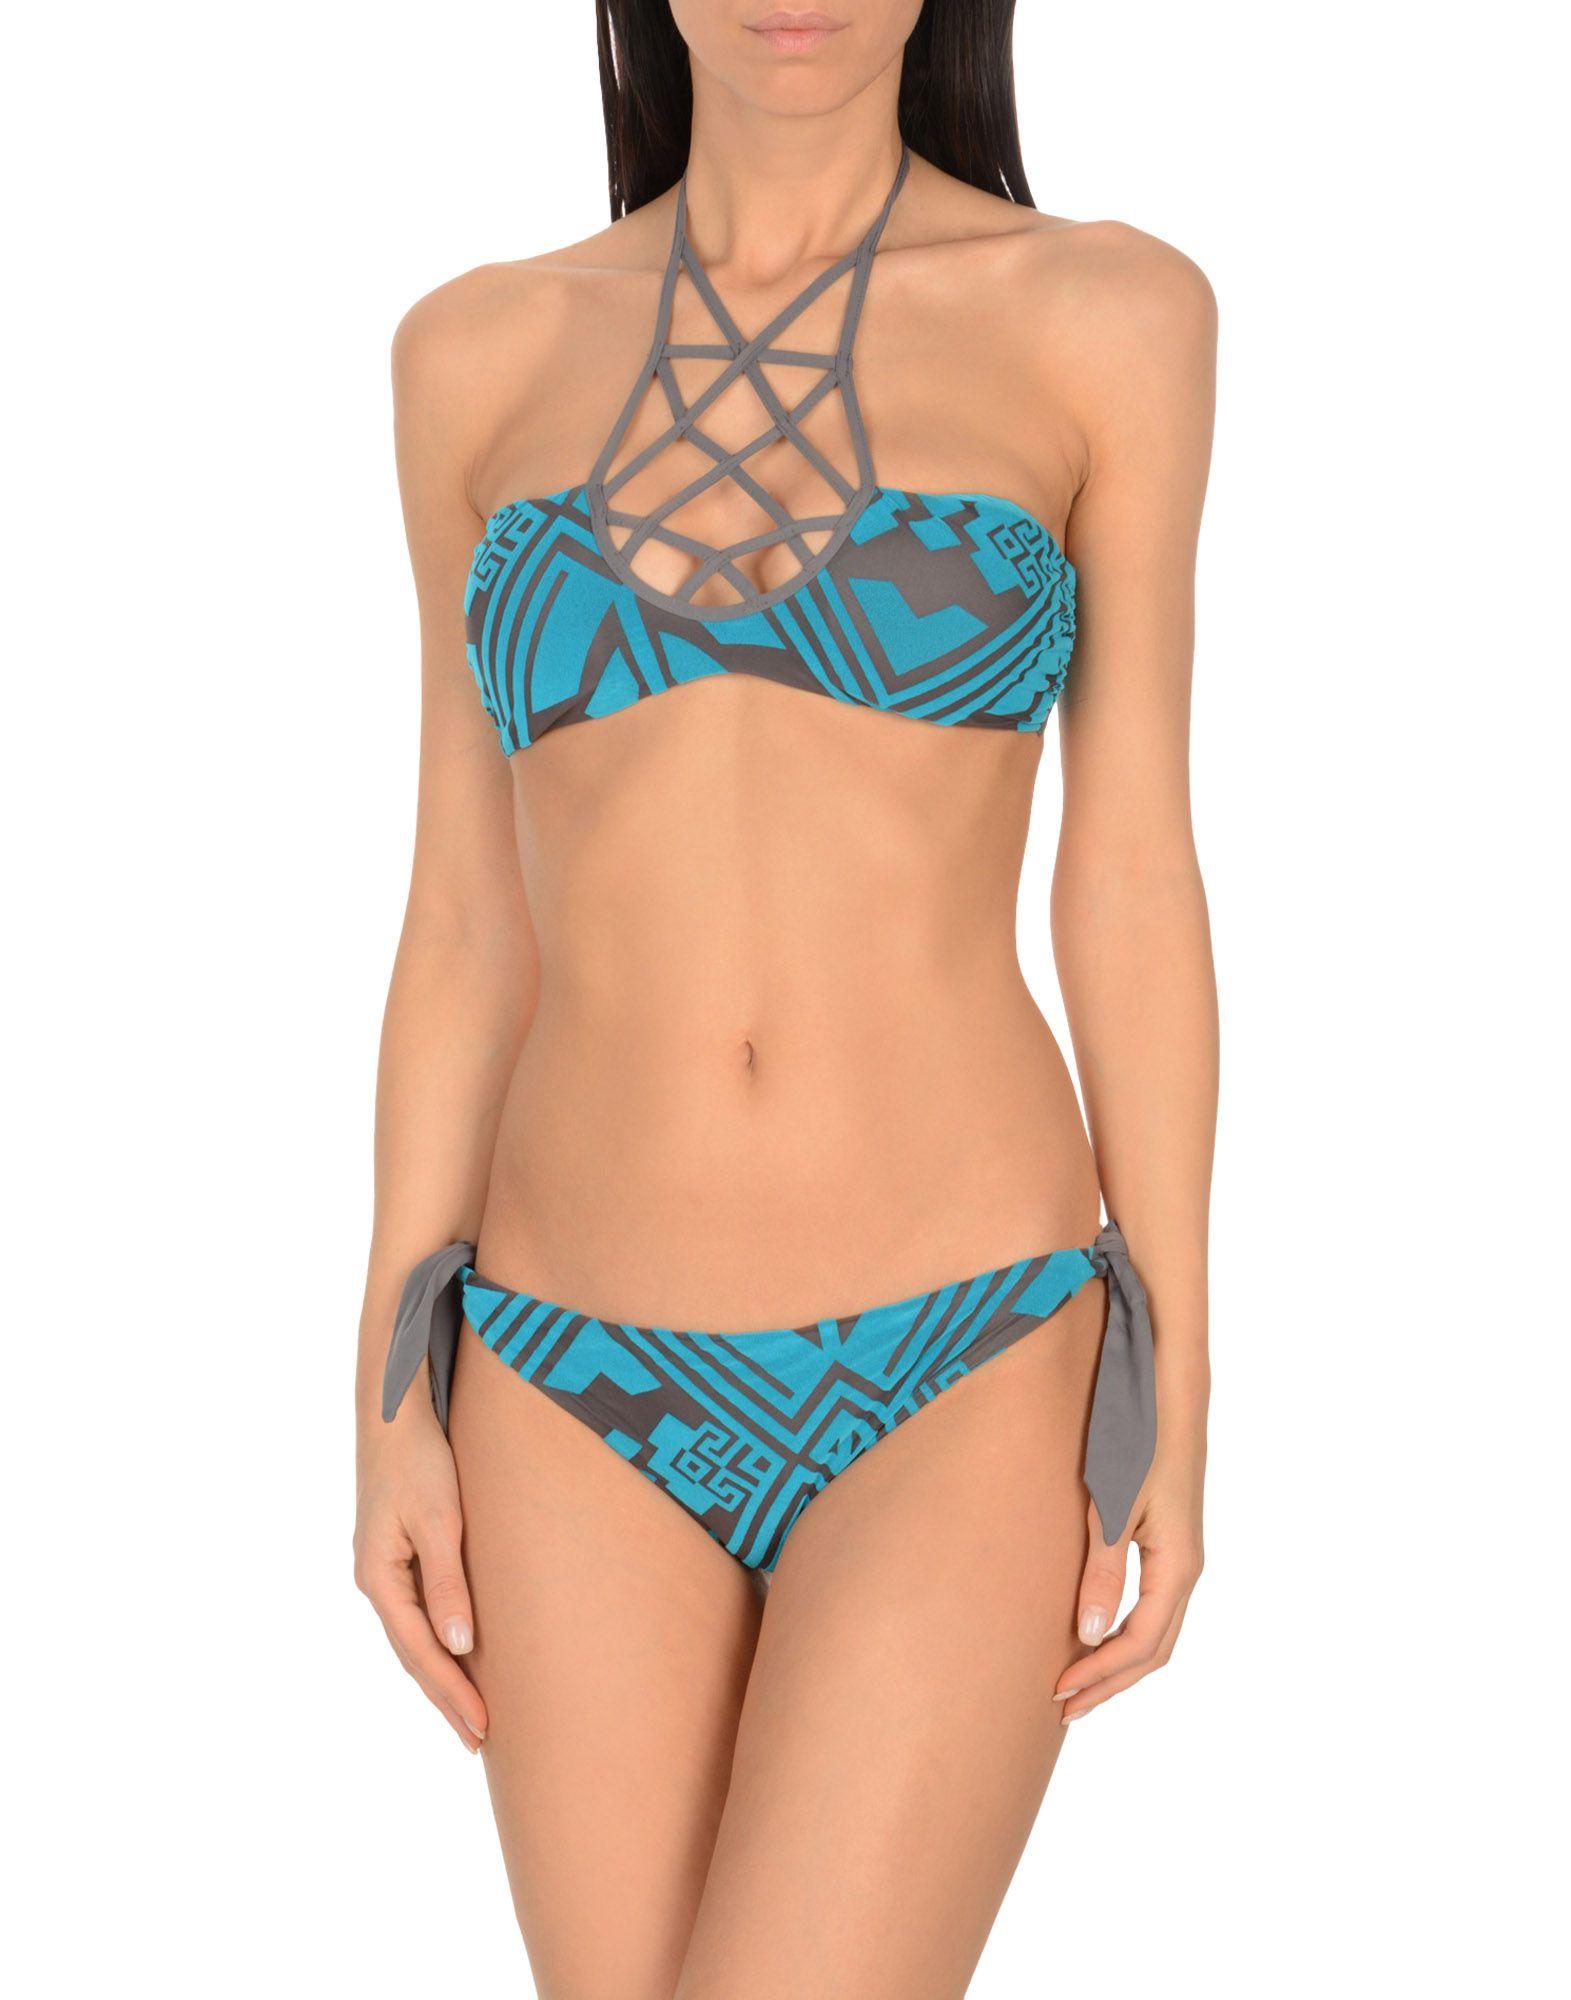 MISS BIKINI Бикини sexy bikini women swimsuit swimwear bikini set biquini bandage bathing suit beachwear push up maillot de bain femme swim suit